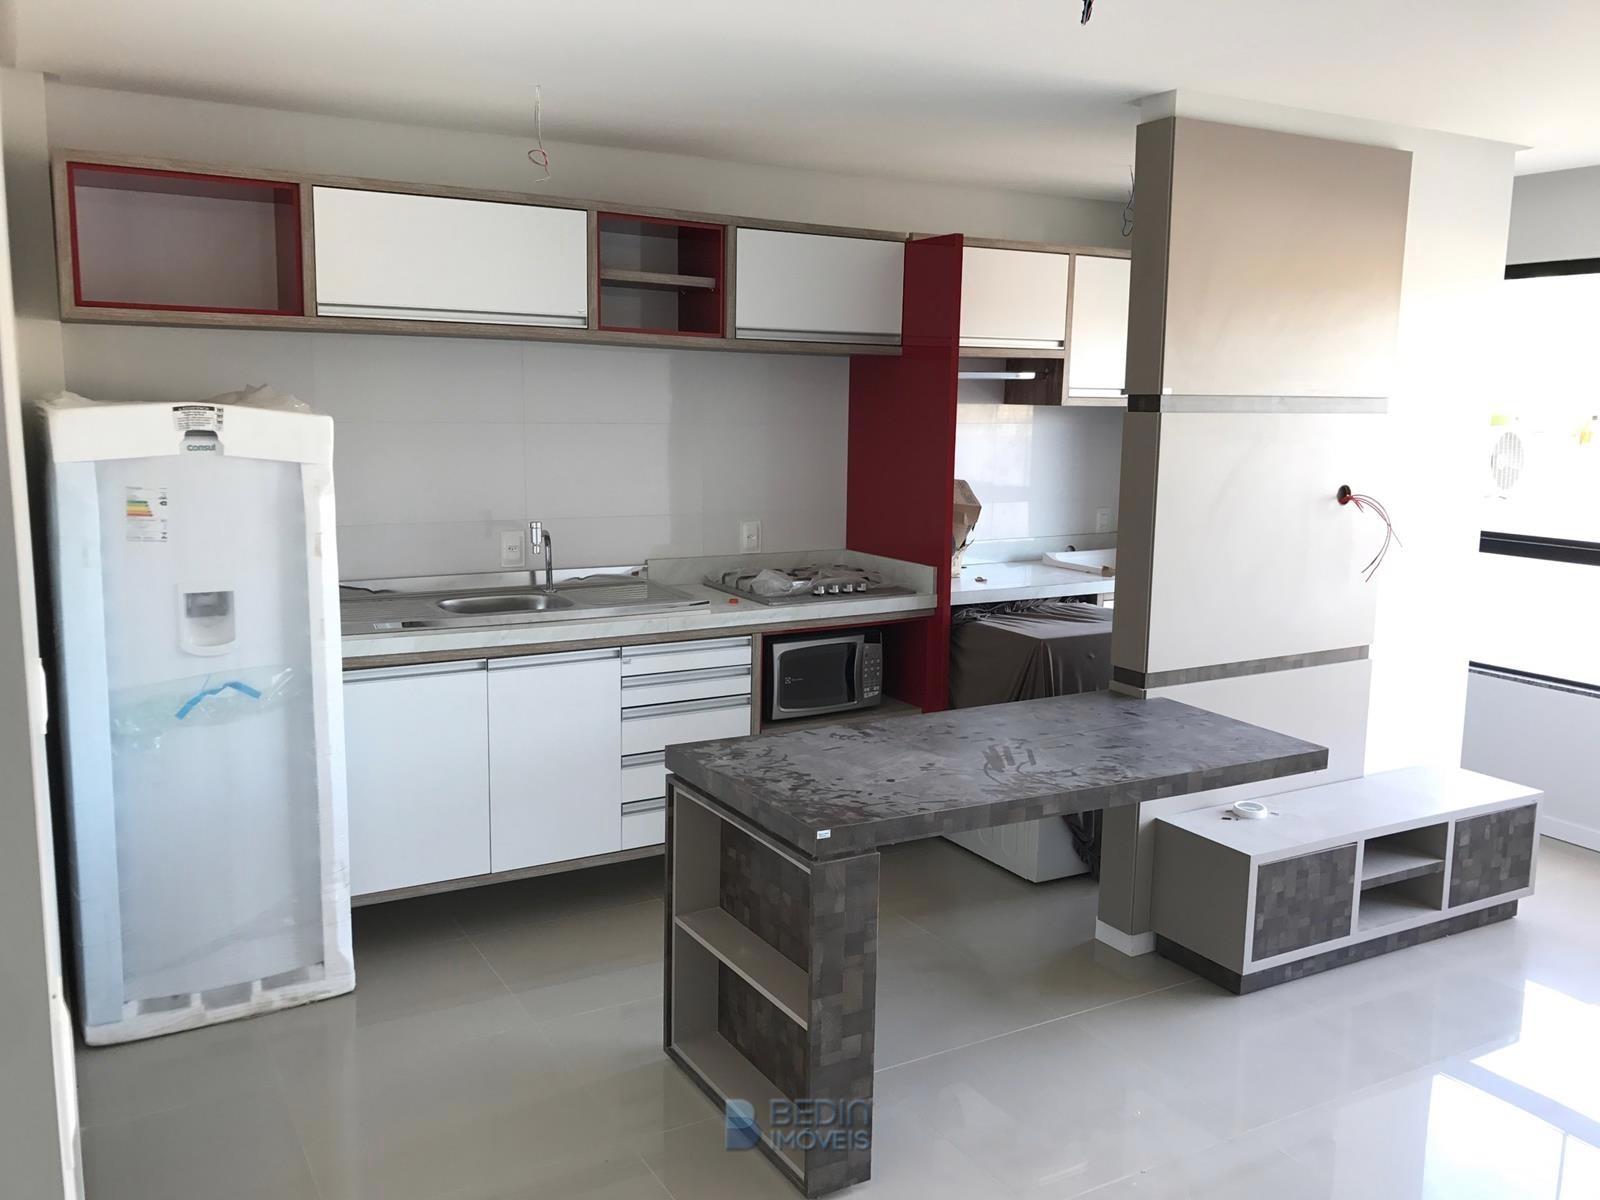 Saída para cozinha - BC